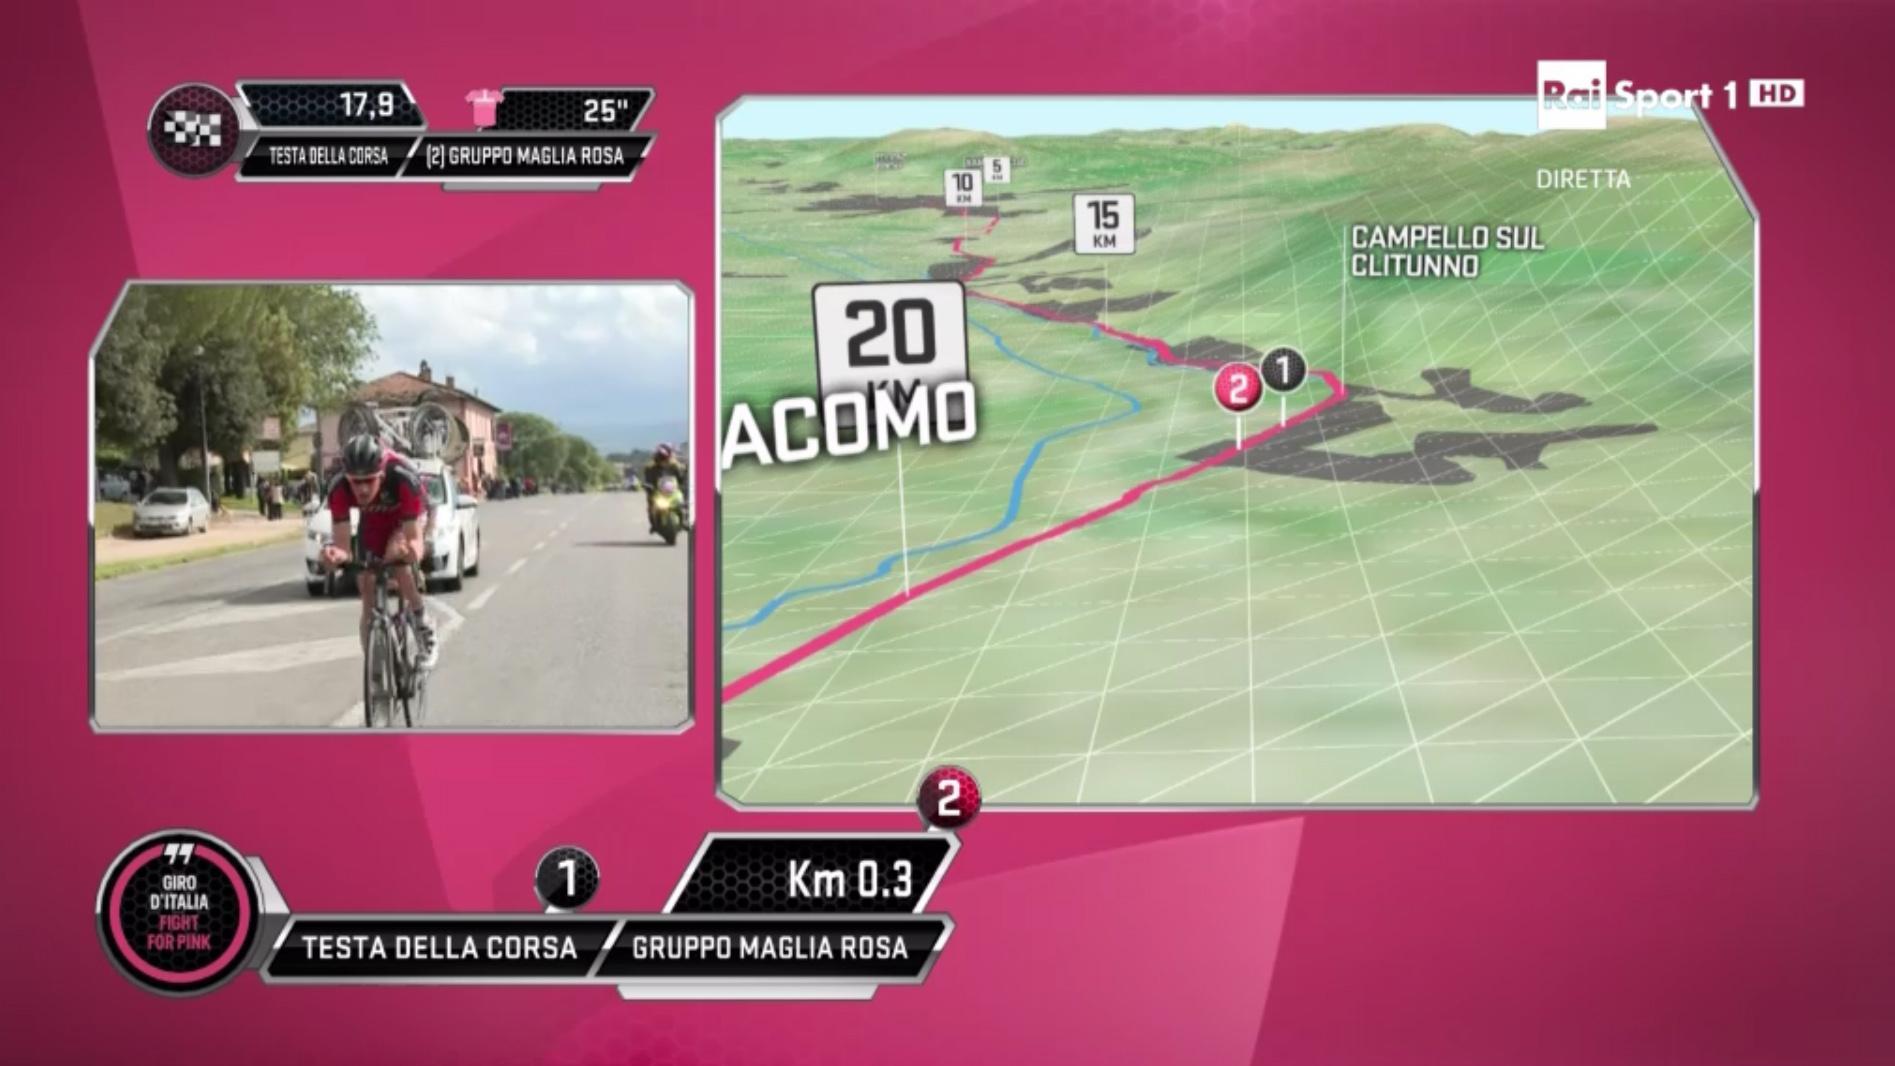 Diretta Video Giro d'Italia